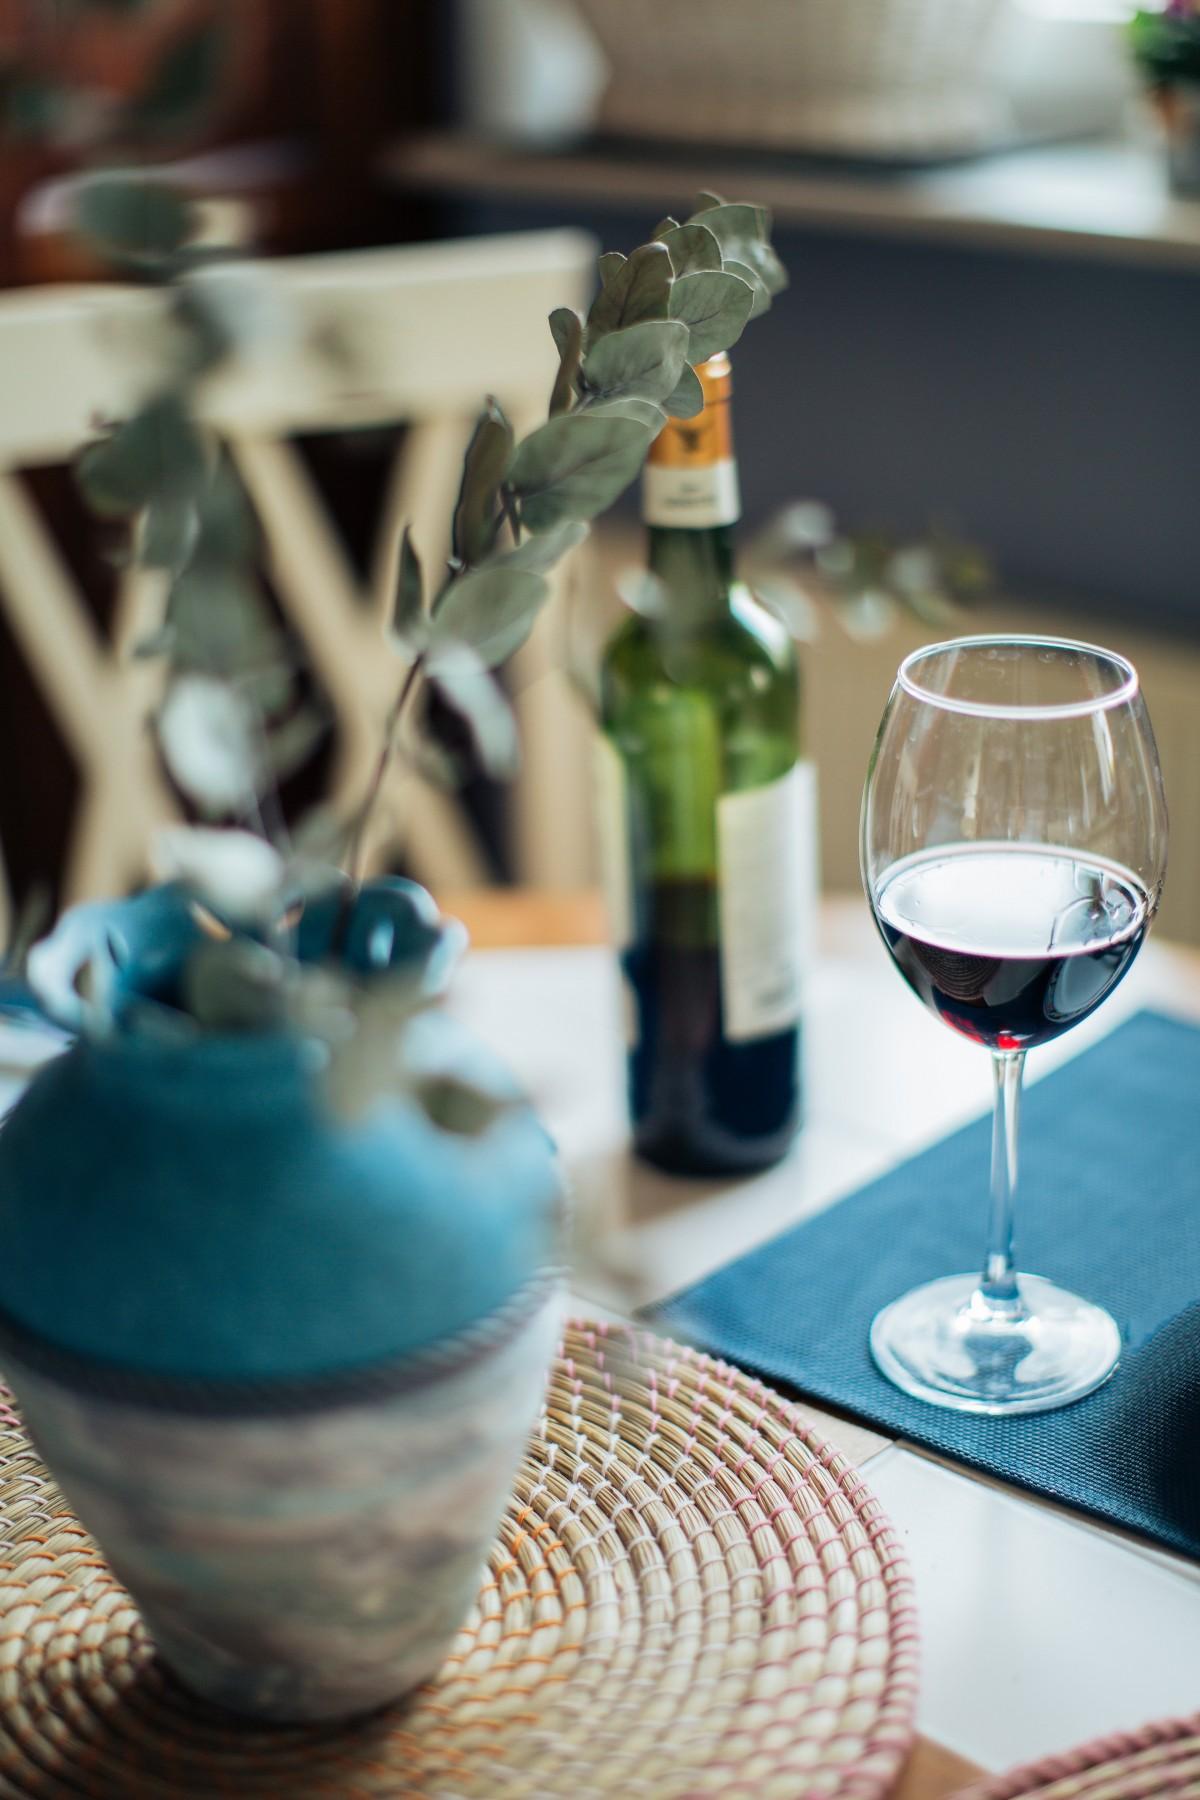 Vin rouge Syrah